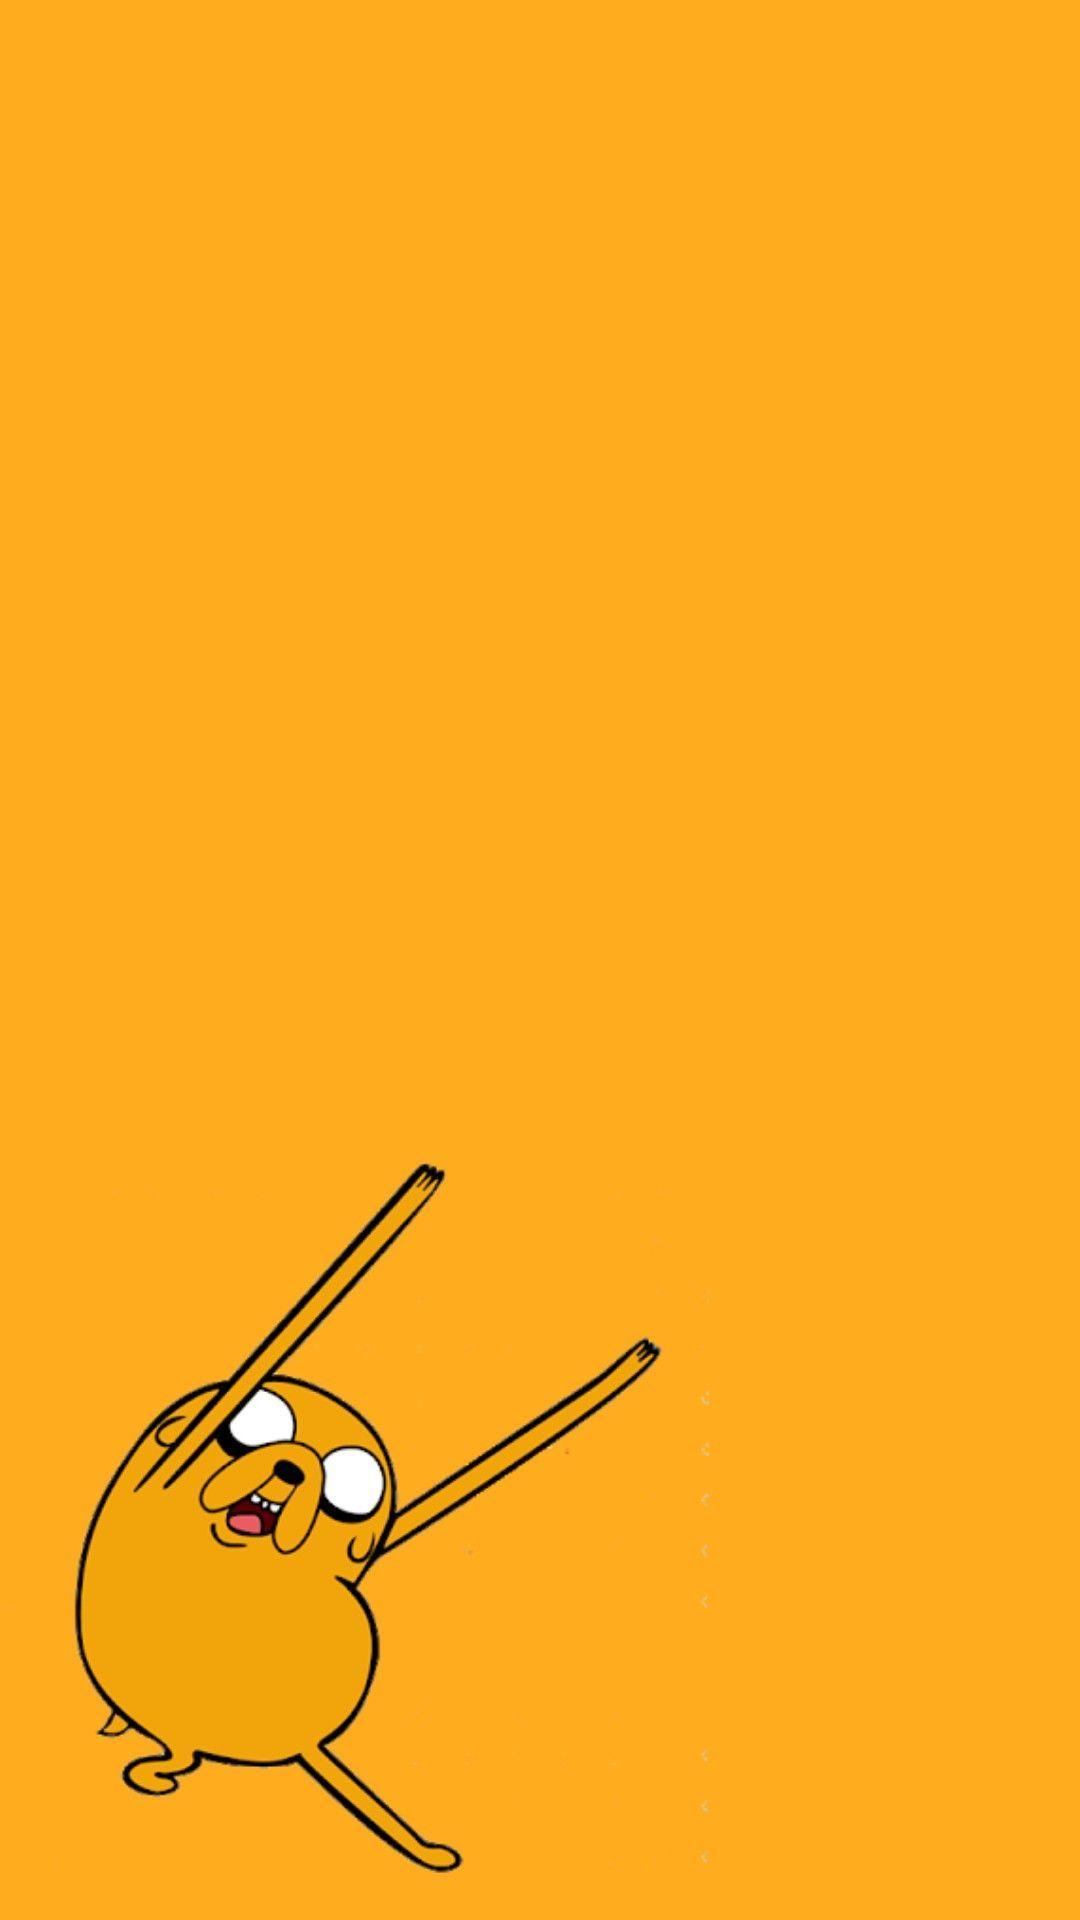 Samsung Wallpaper Yellow Hintergrundbild Tapete Jake Wallpaper Nerd Adventuretime Adventure Time Wallpaper Cartoon Wallpaper Iphone Spongebob Wallpaper